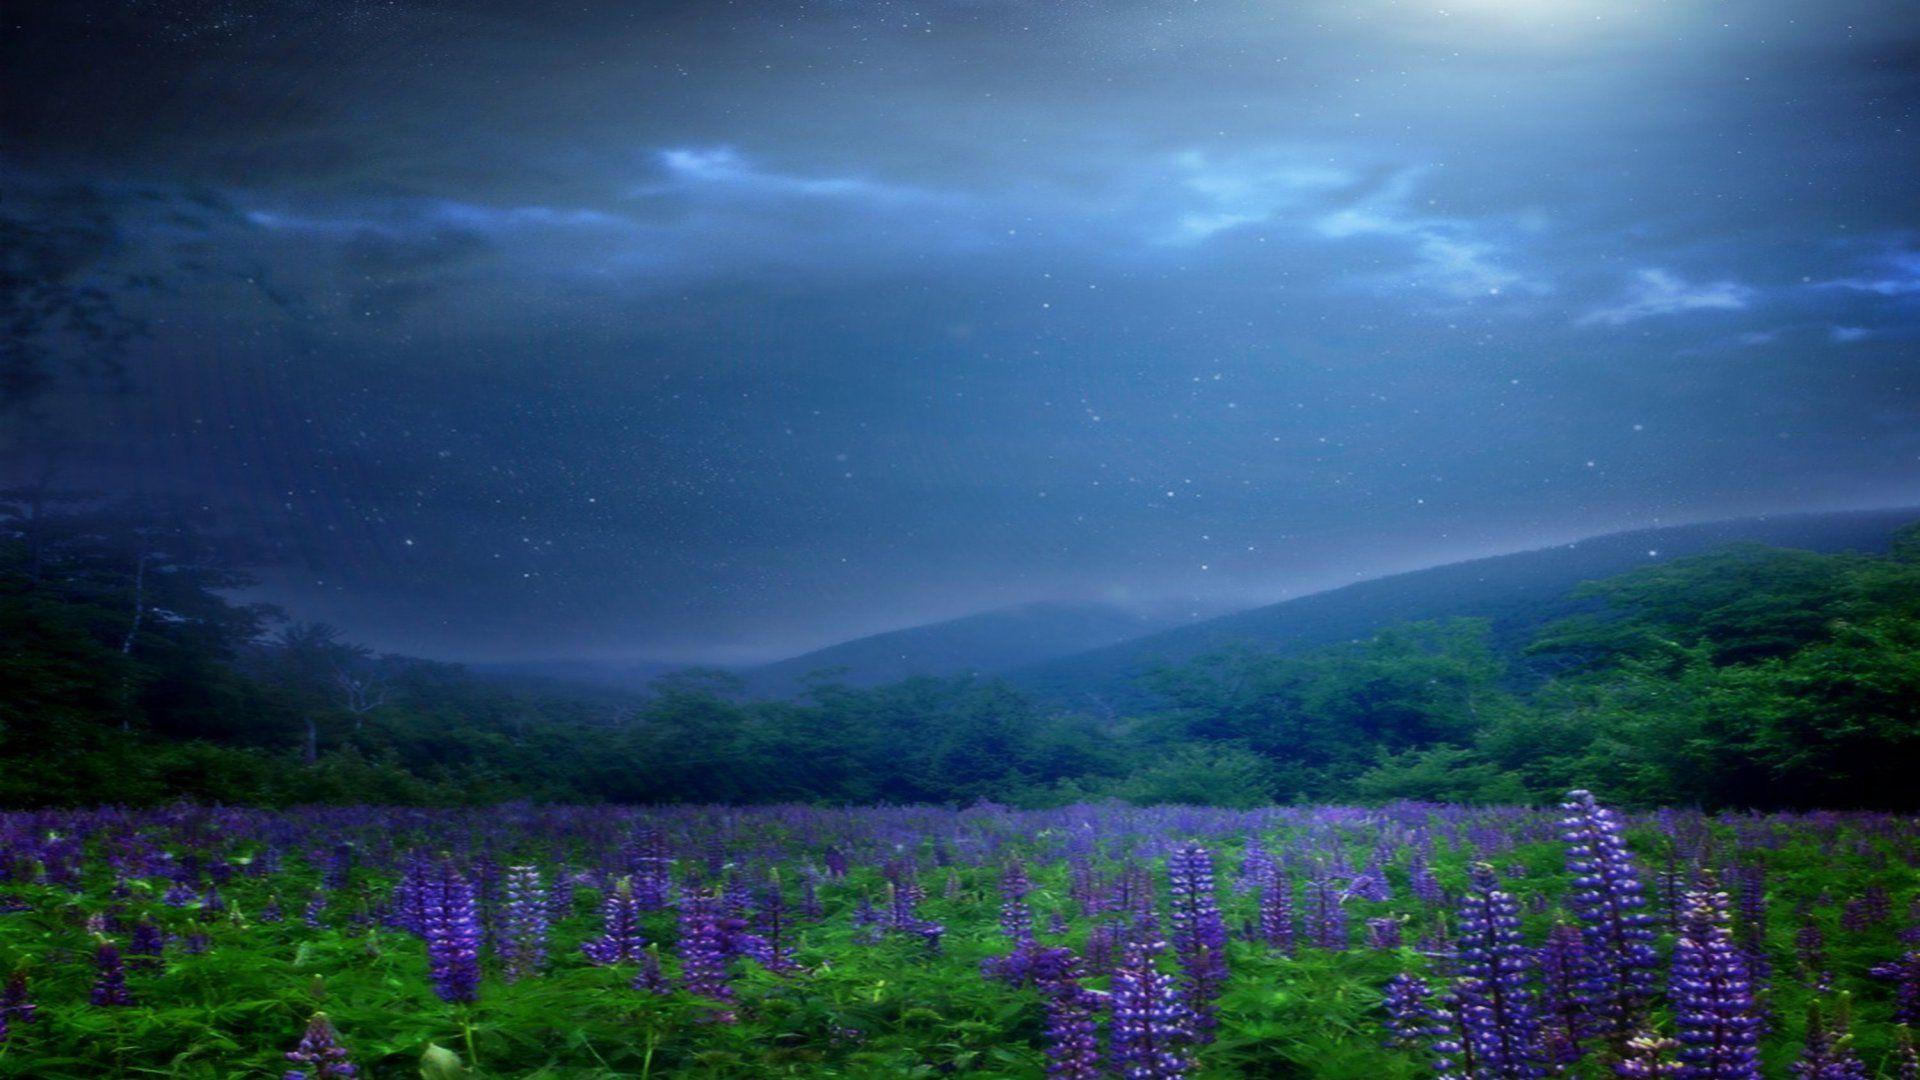 Night Photos Of Nature